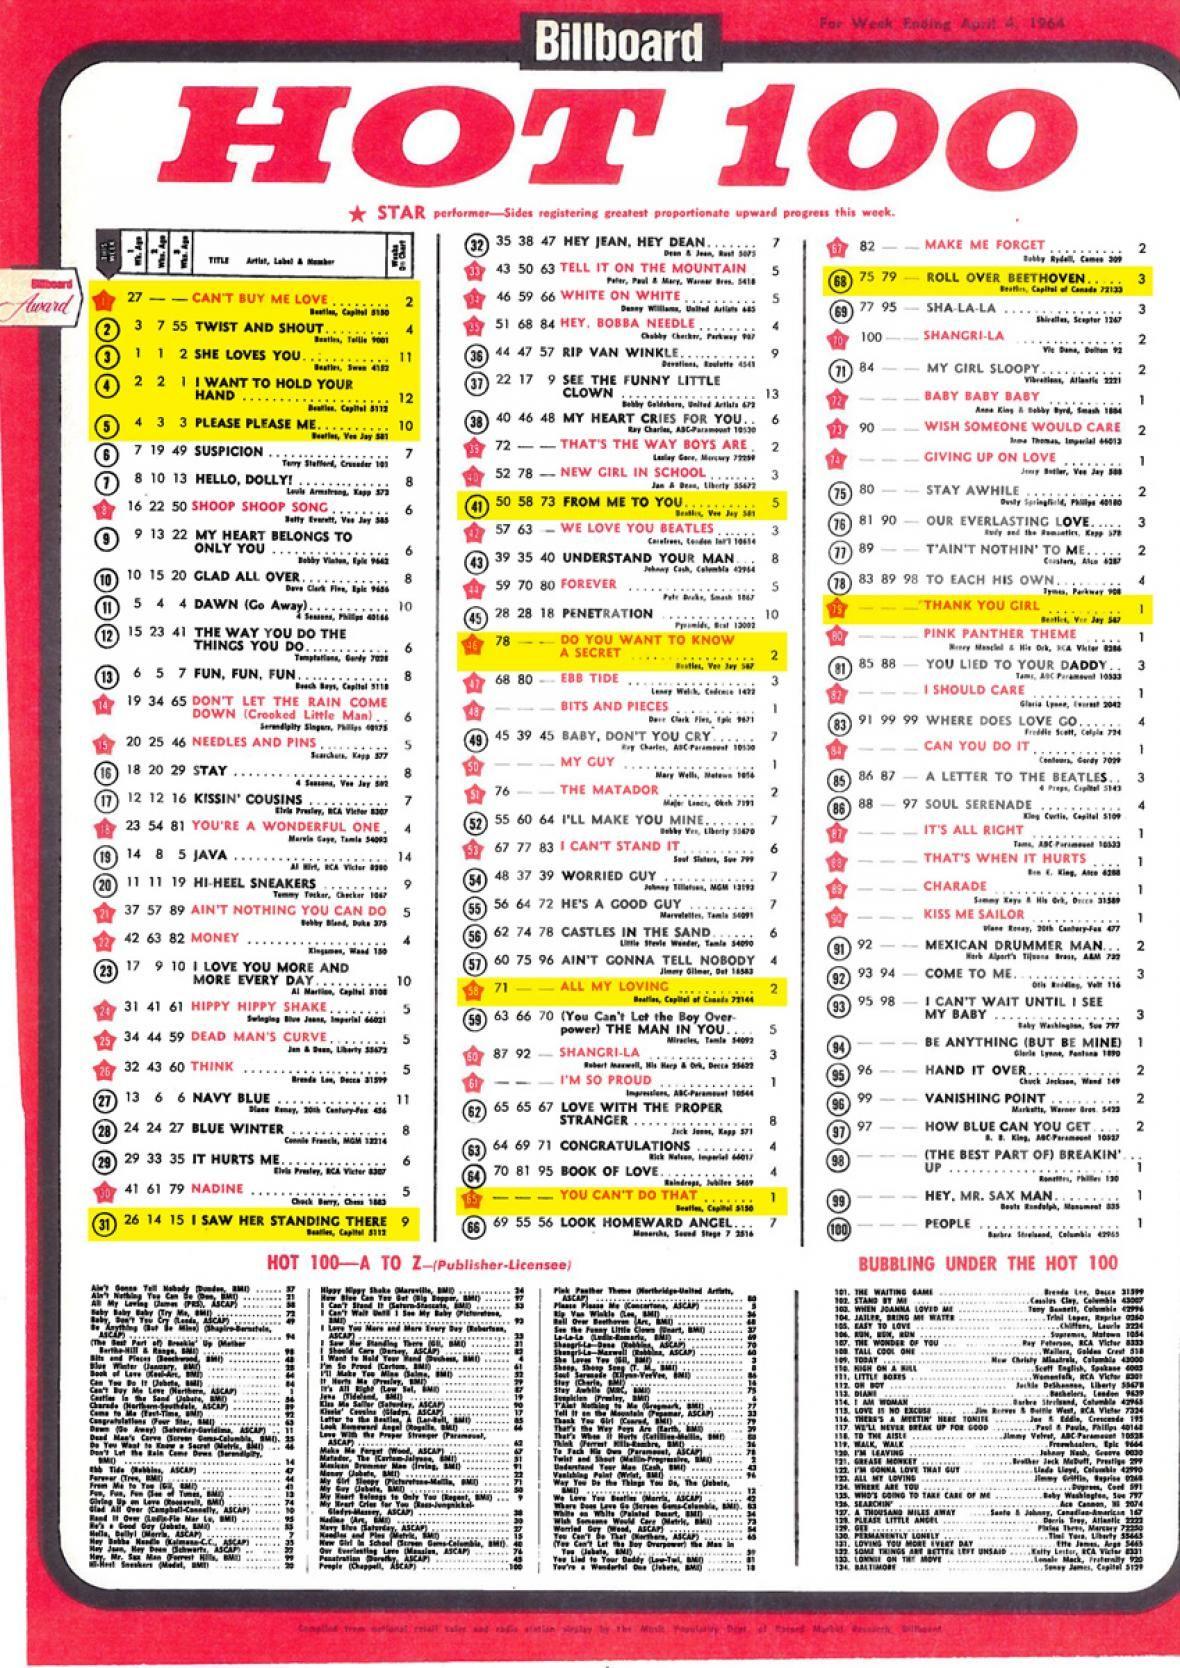 billboard top 100 singles 1969